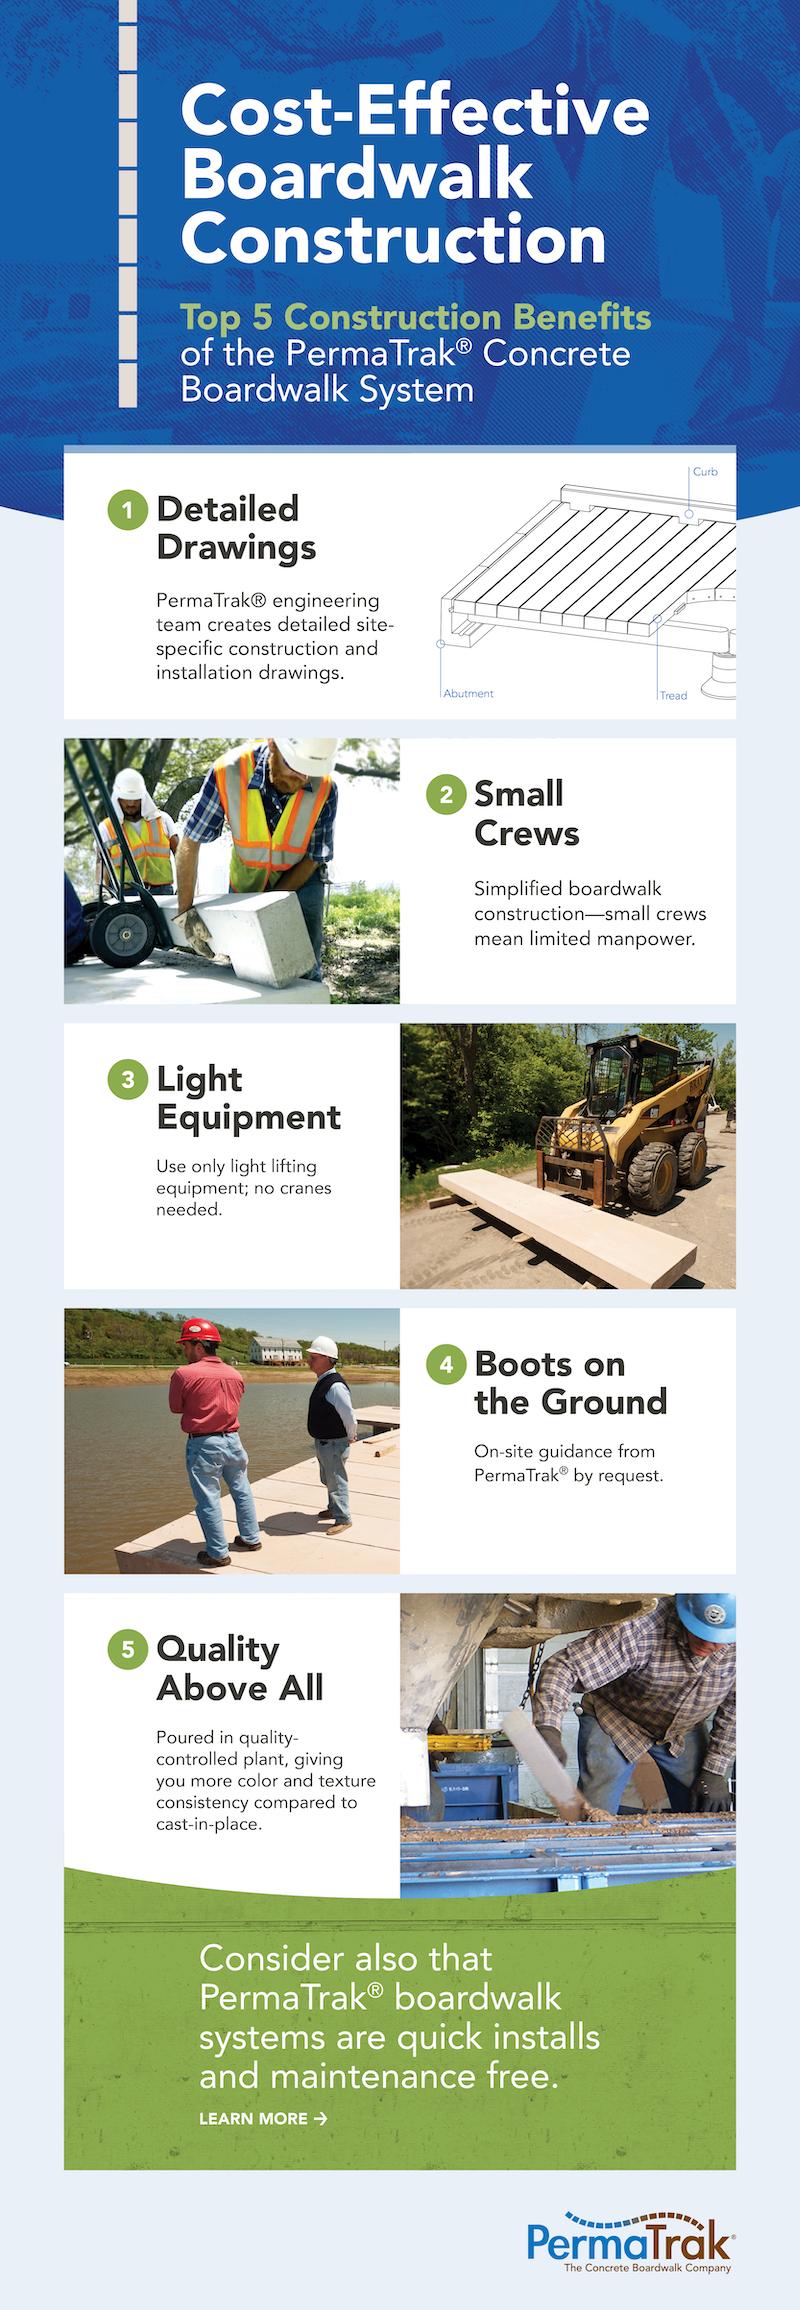 PermaTrak_Cost_Effective_Construction_Benefits_Infographic